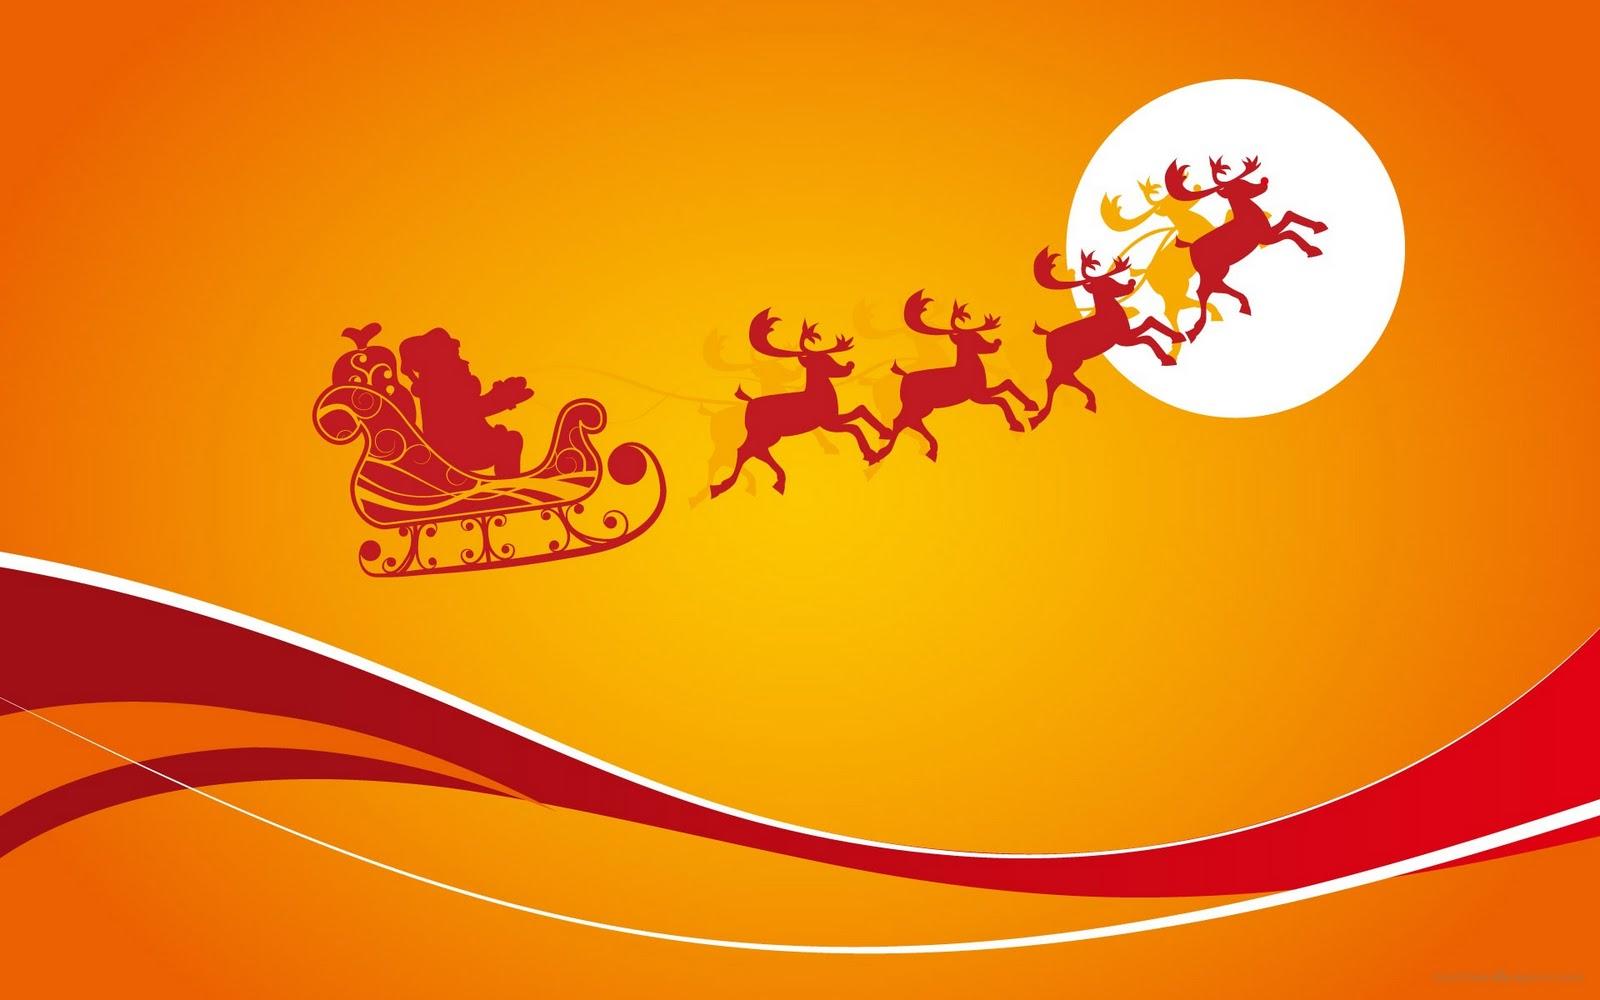 http://4.bp.blogspot.com/-JeS49sF3BpA/Tqa0gqHa8tI/AAAAAAAACeE/BiRFVAc9vCY/s1600/Vector-Christmas-santa-clause+2012.jpg